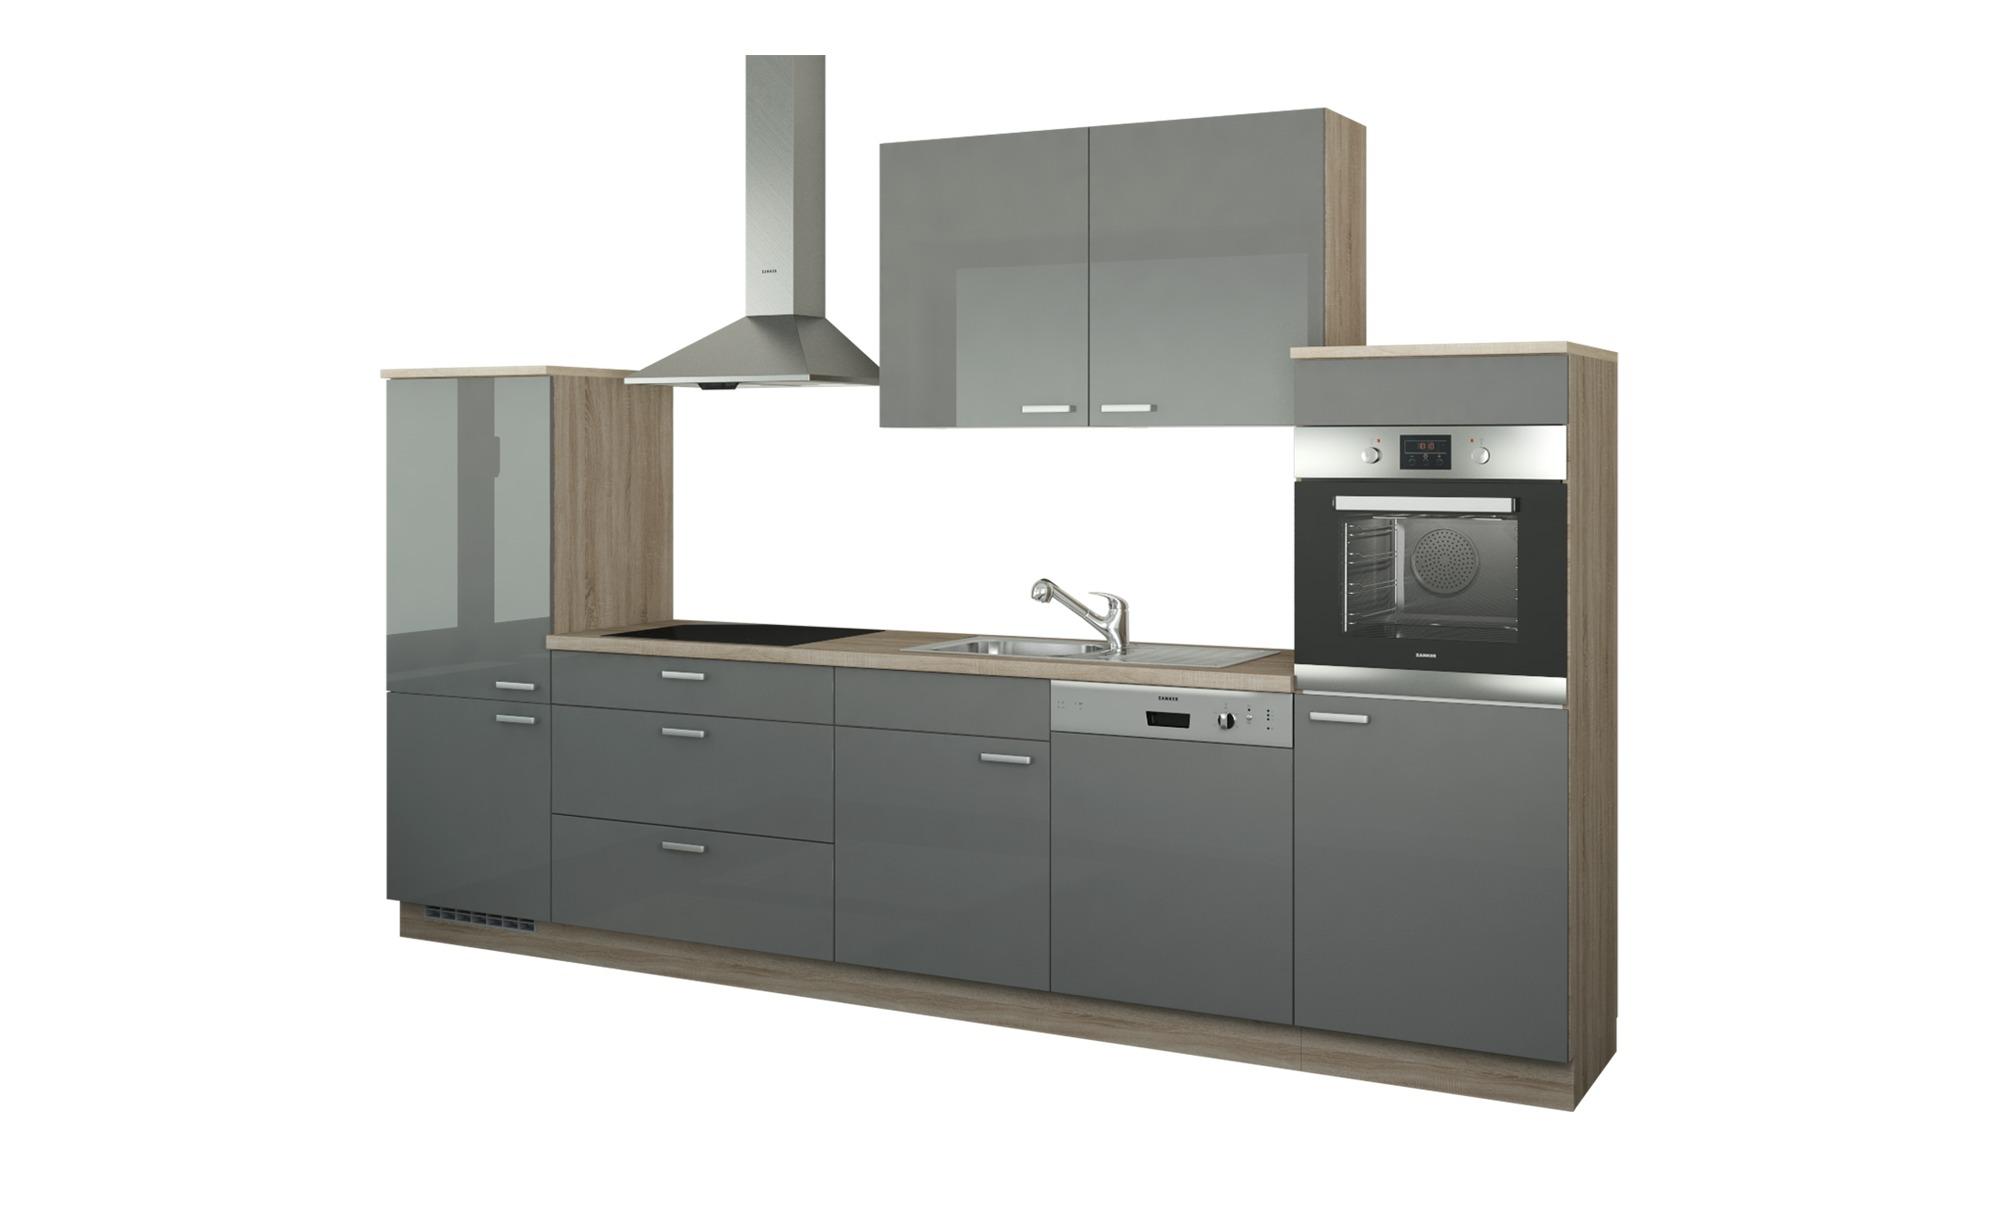 Full Size of Ikea Küche Ohne Elektrogeräte Küche Ohne Elektrogeräte Kaufen Was Kostet Eine Küche Ohne Elektrogeräte Roller Küche Ohne Elektrogeräte Küche Küche Ohne Elektrogeräte